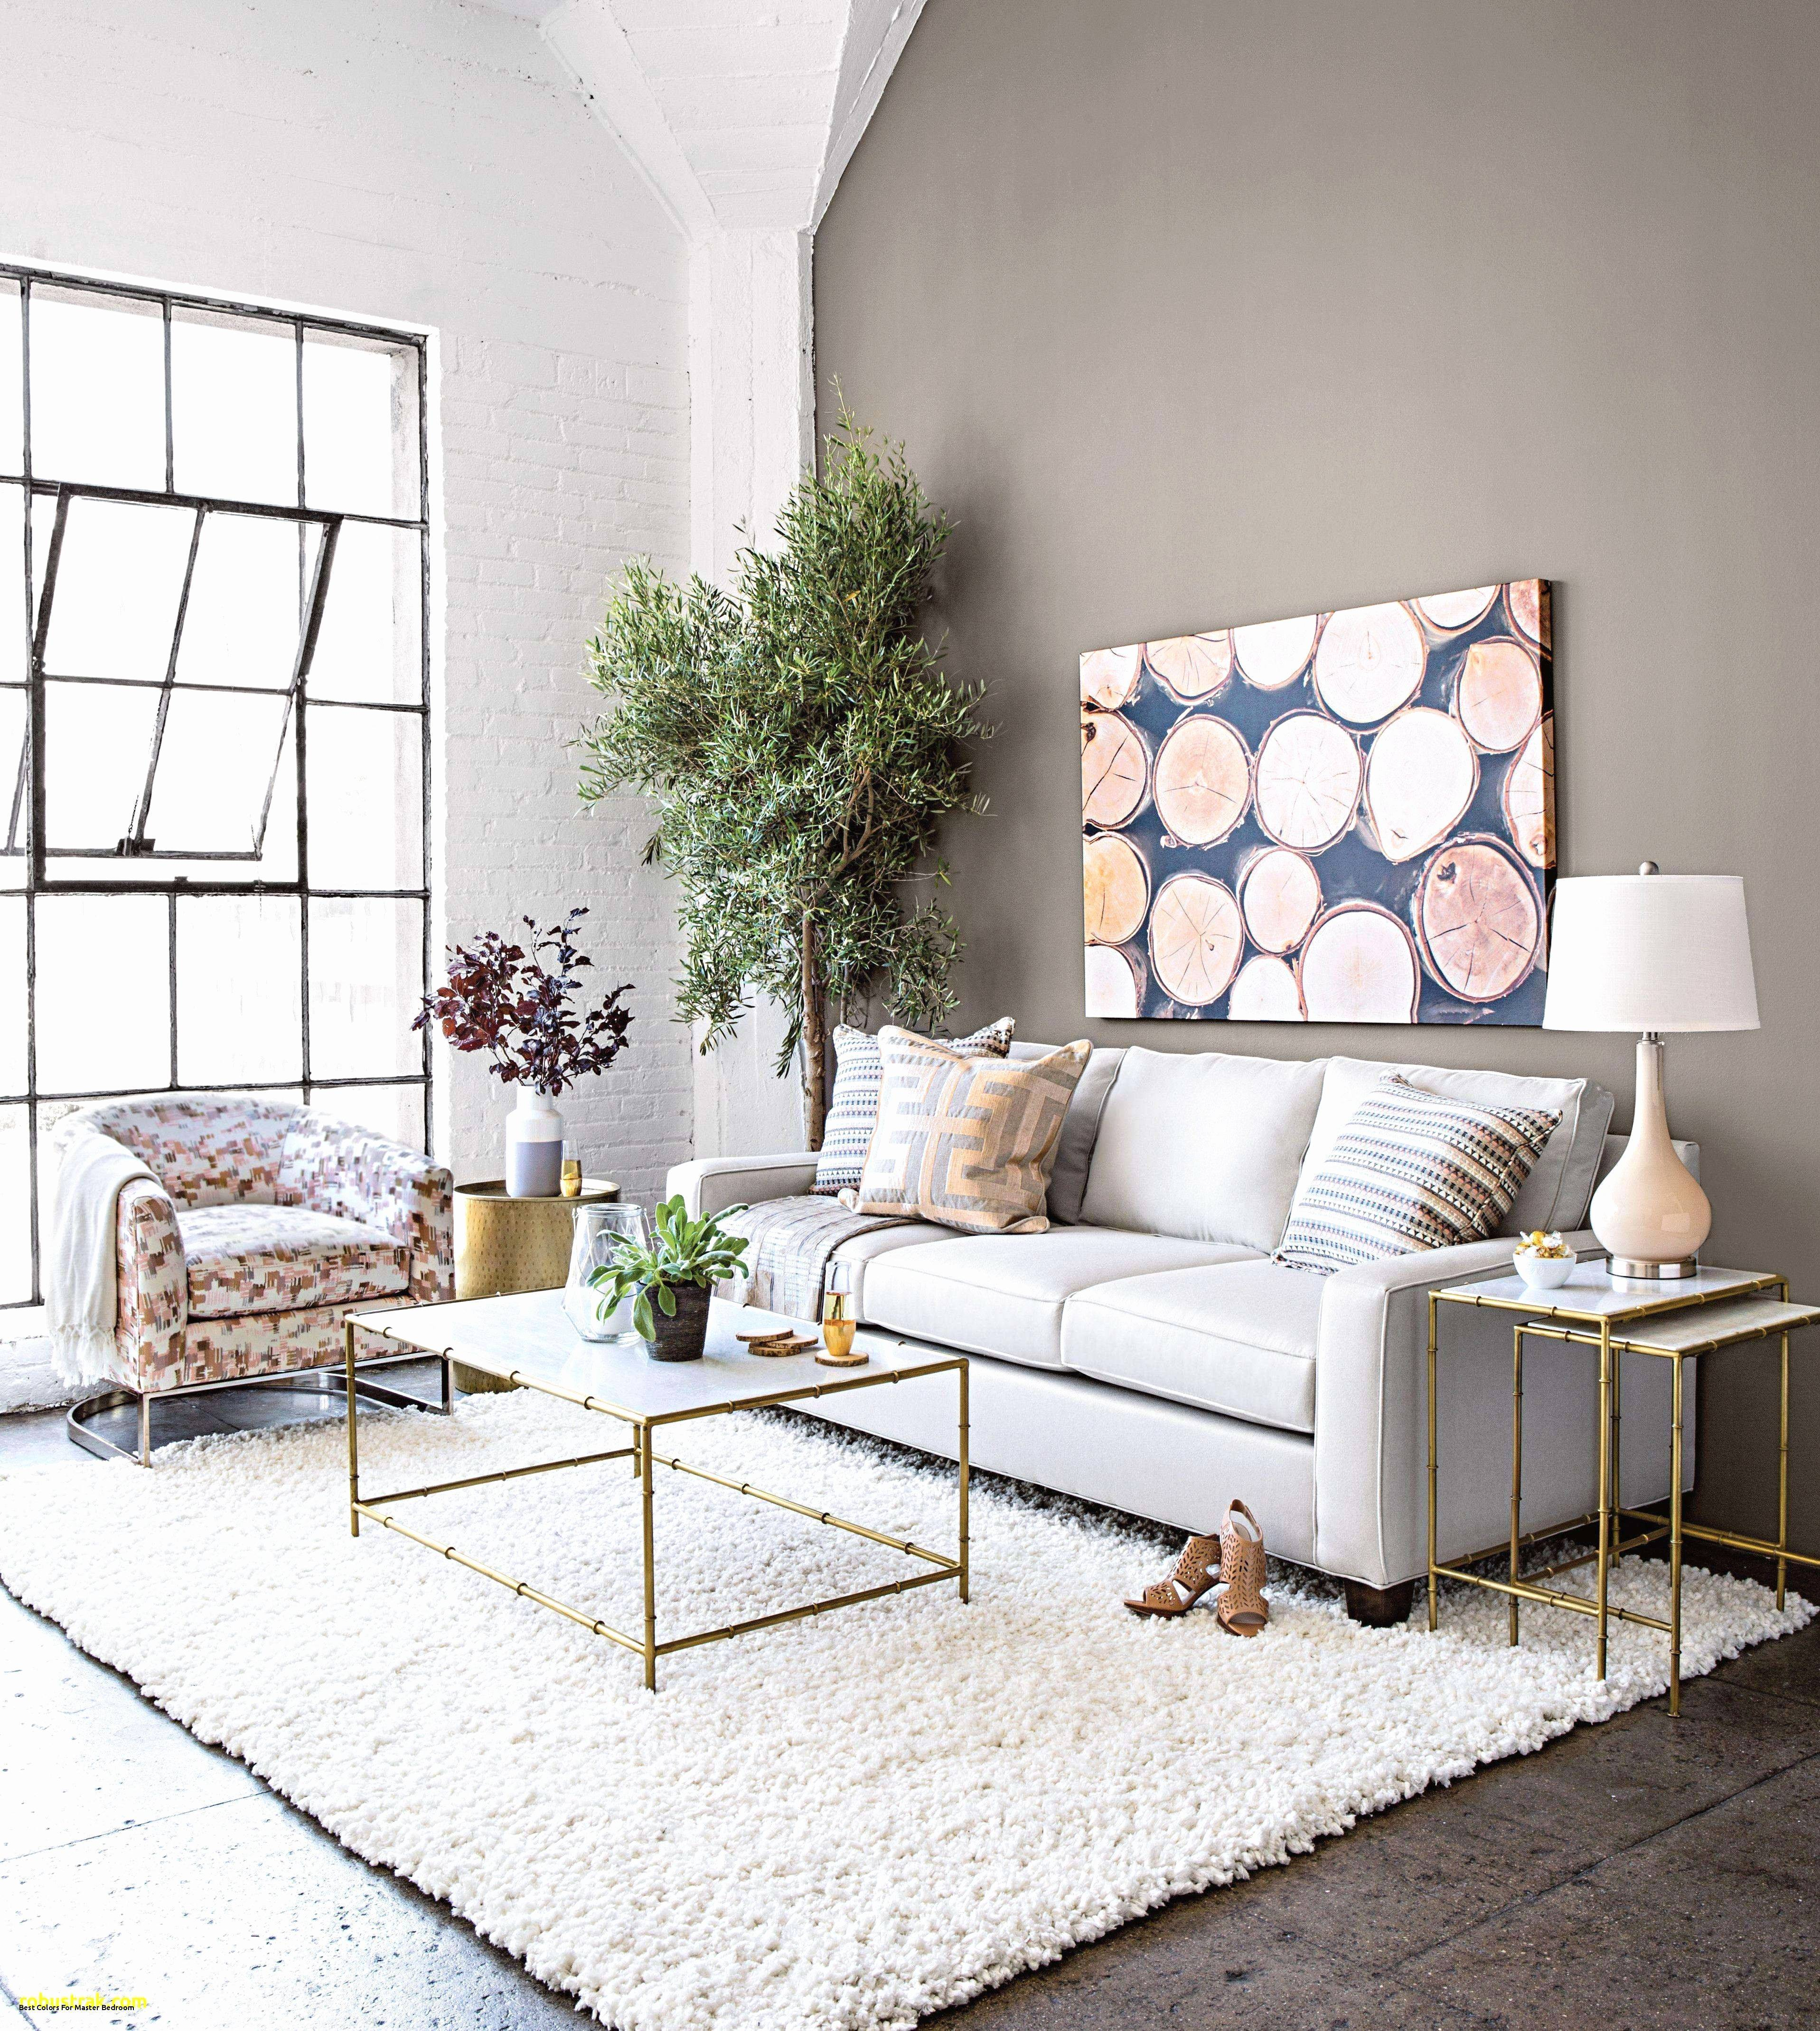 apartment decorating color schemes beautiful 48 elegant cozy living room decor ideas color schemes 2019 of apartment decorating color schemes